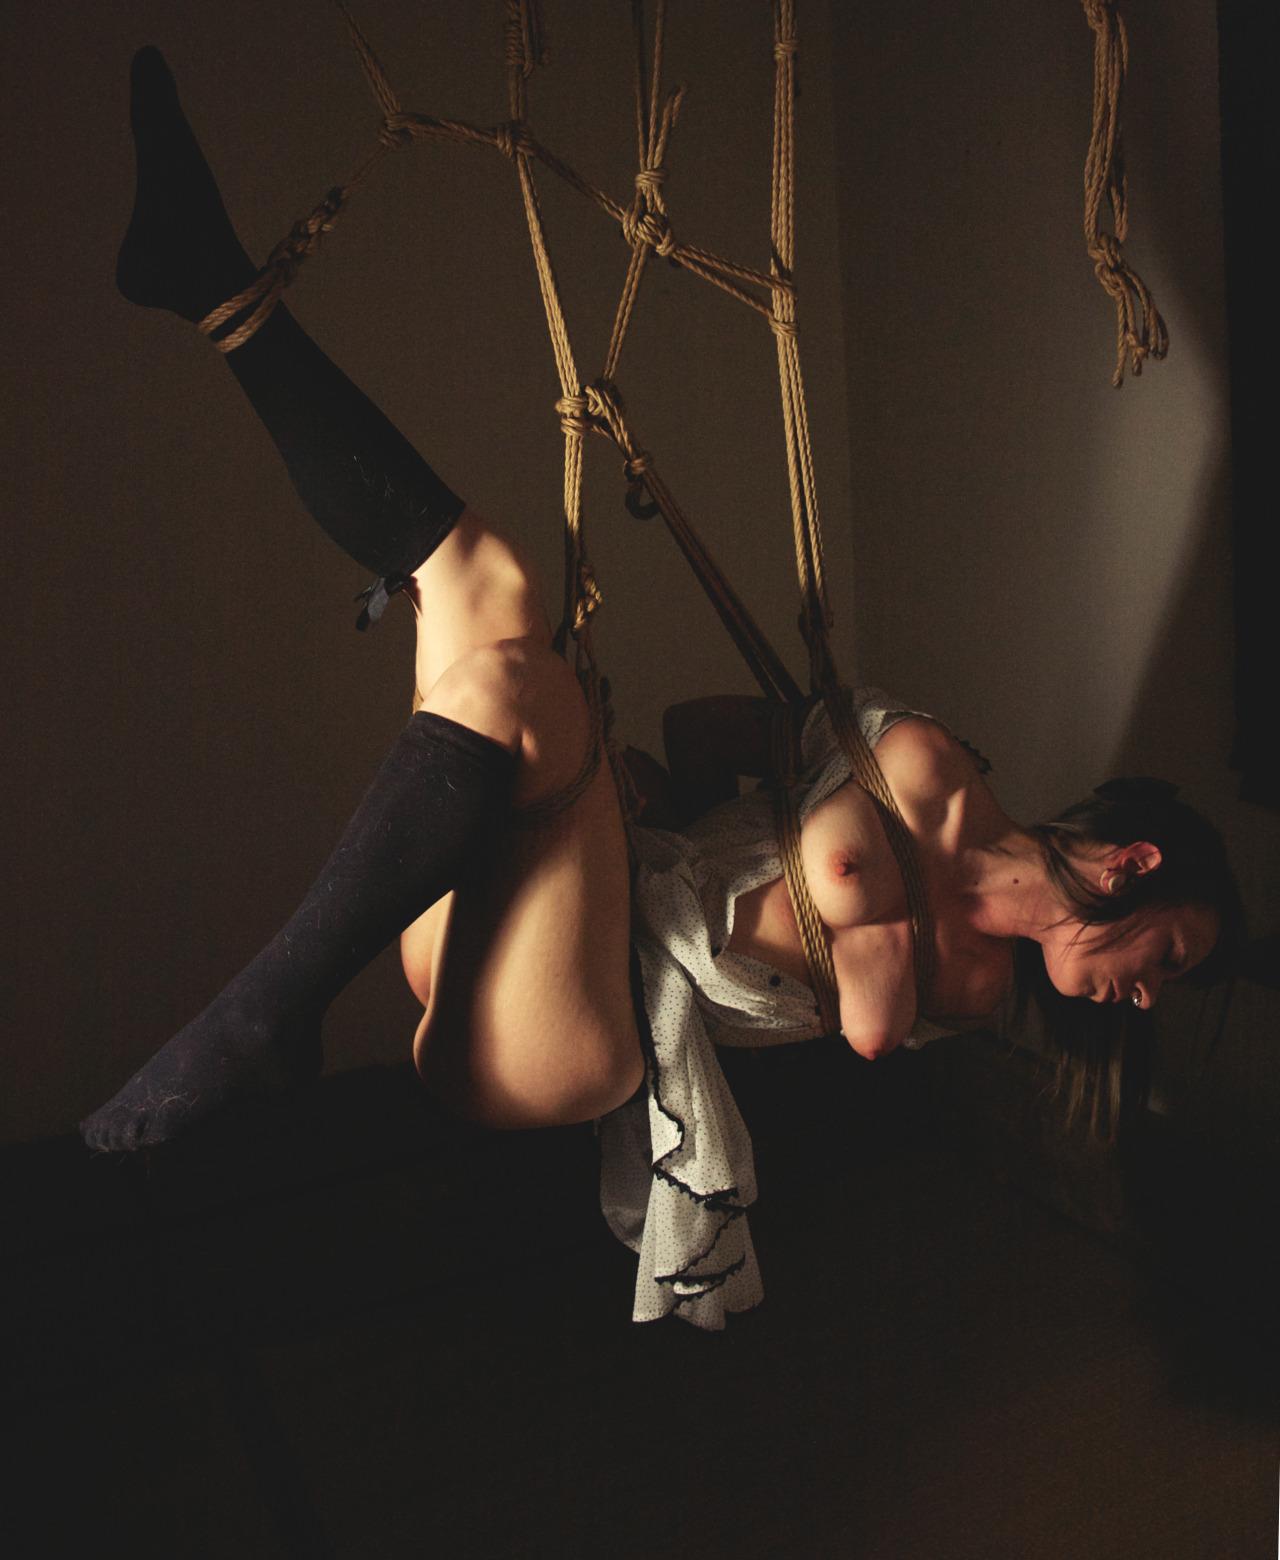 【SMエロ画像】バランス保った上でのプレイw真似しちゃいけない宙吊り緊縛M女www 10